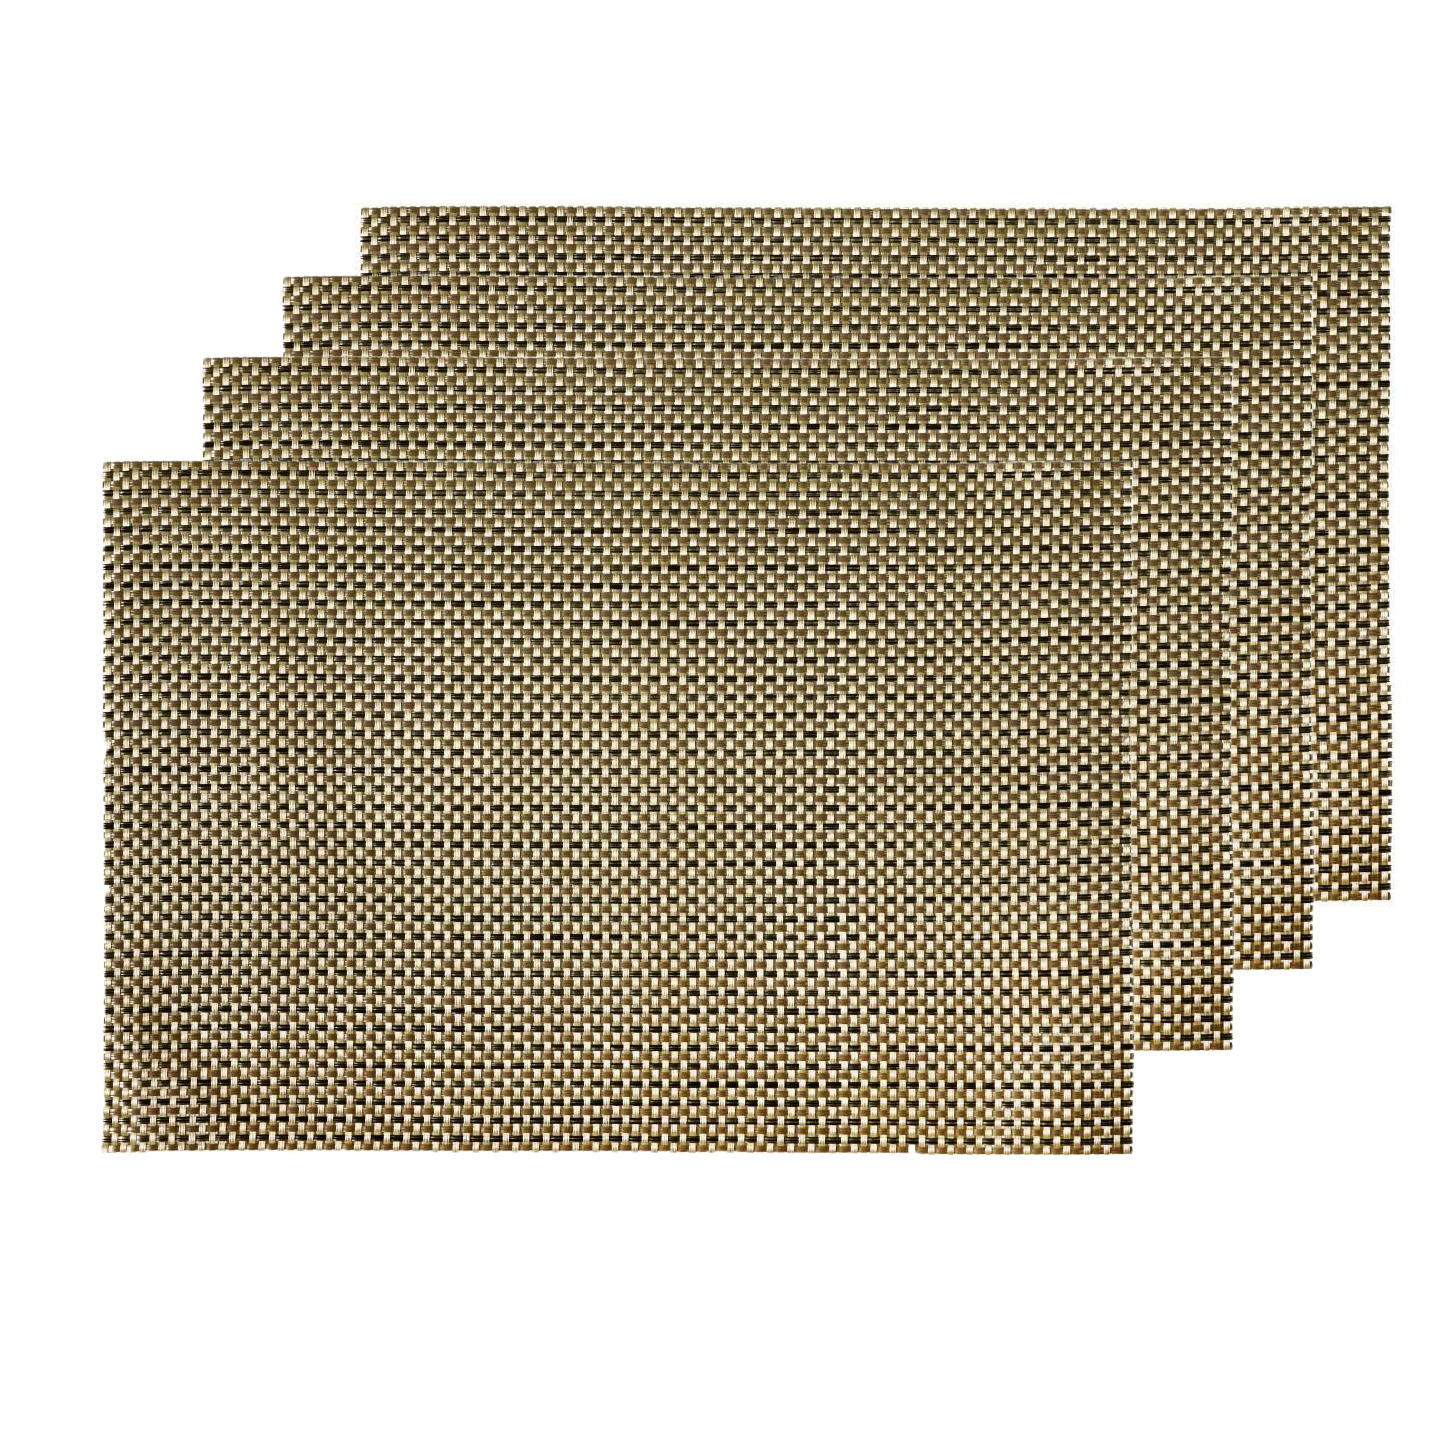 4-er Pack Leinen Platzsets 50x35 cm Stoff Tischsets Weiss Grau